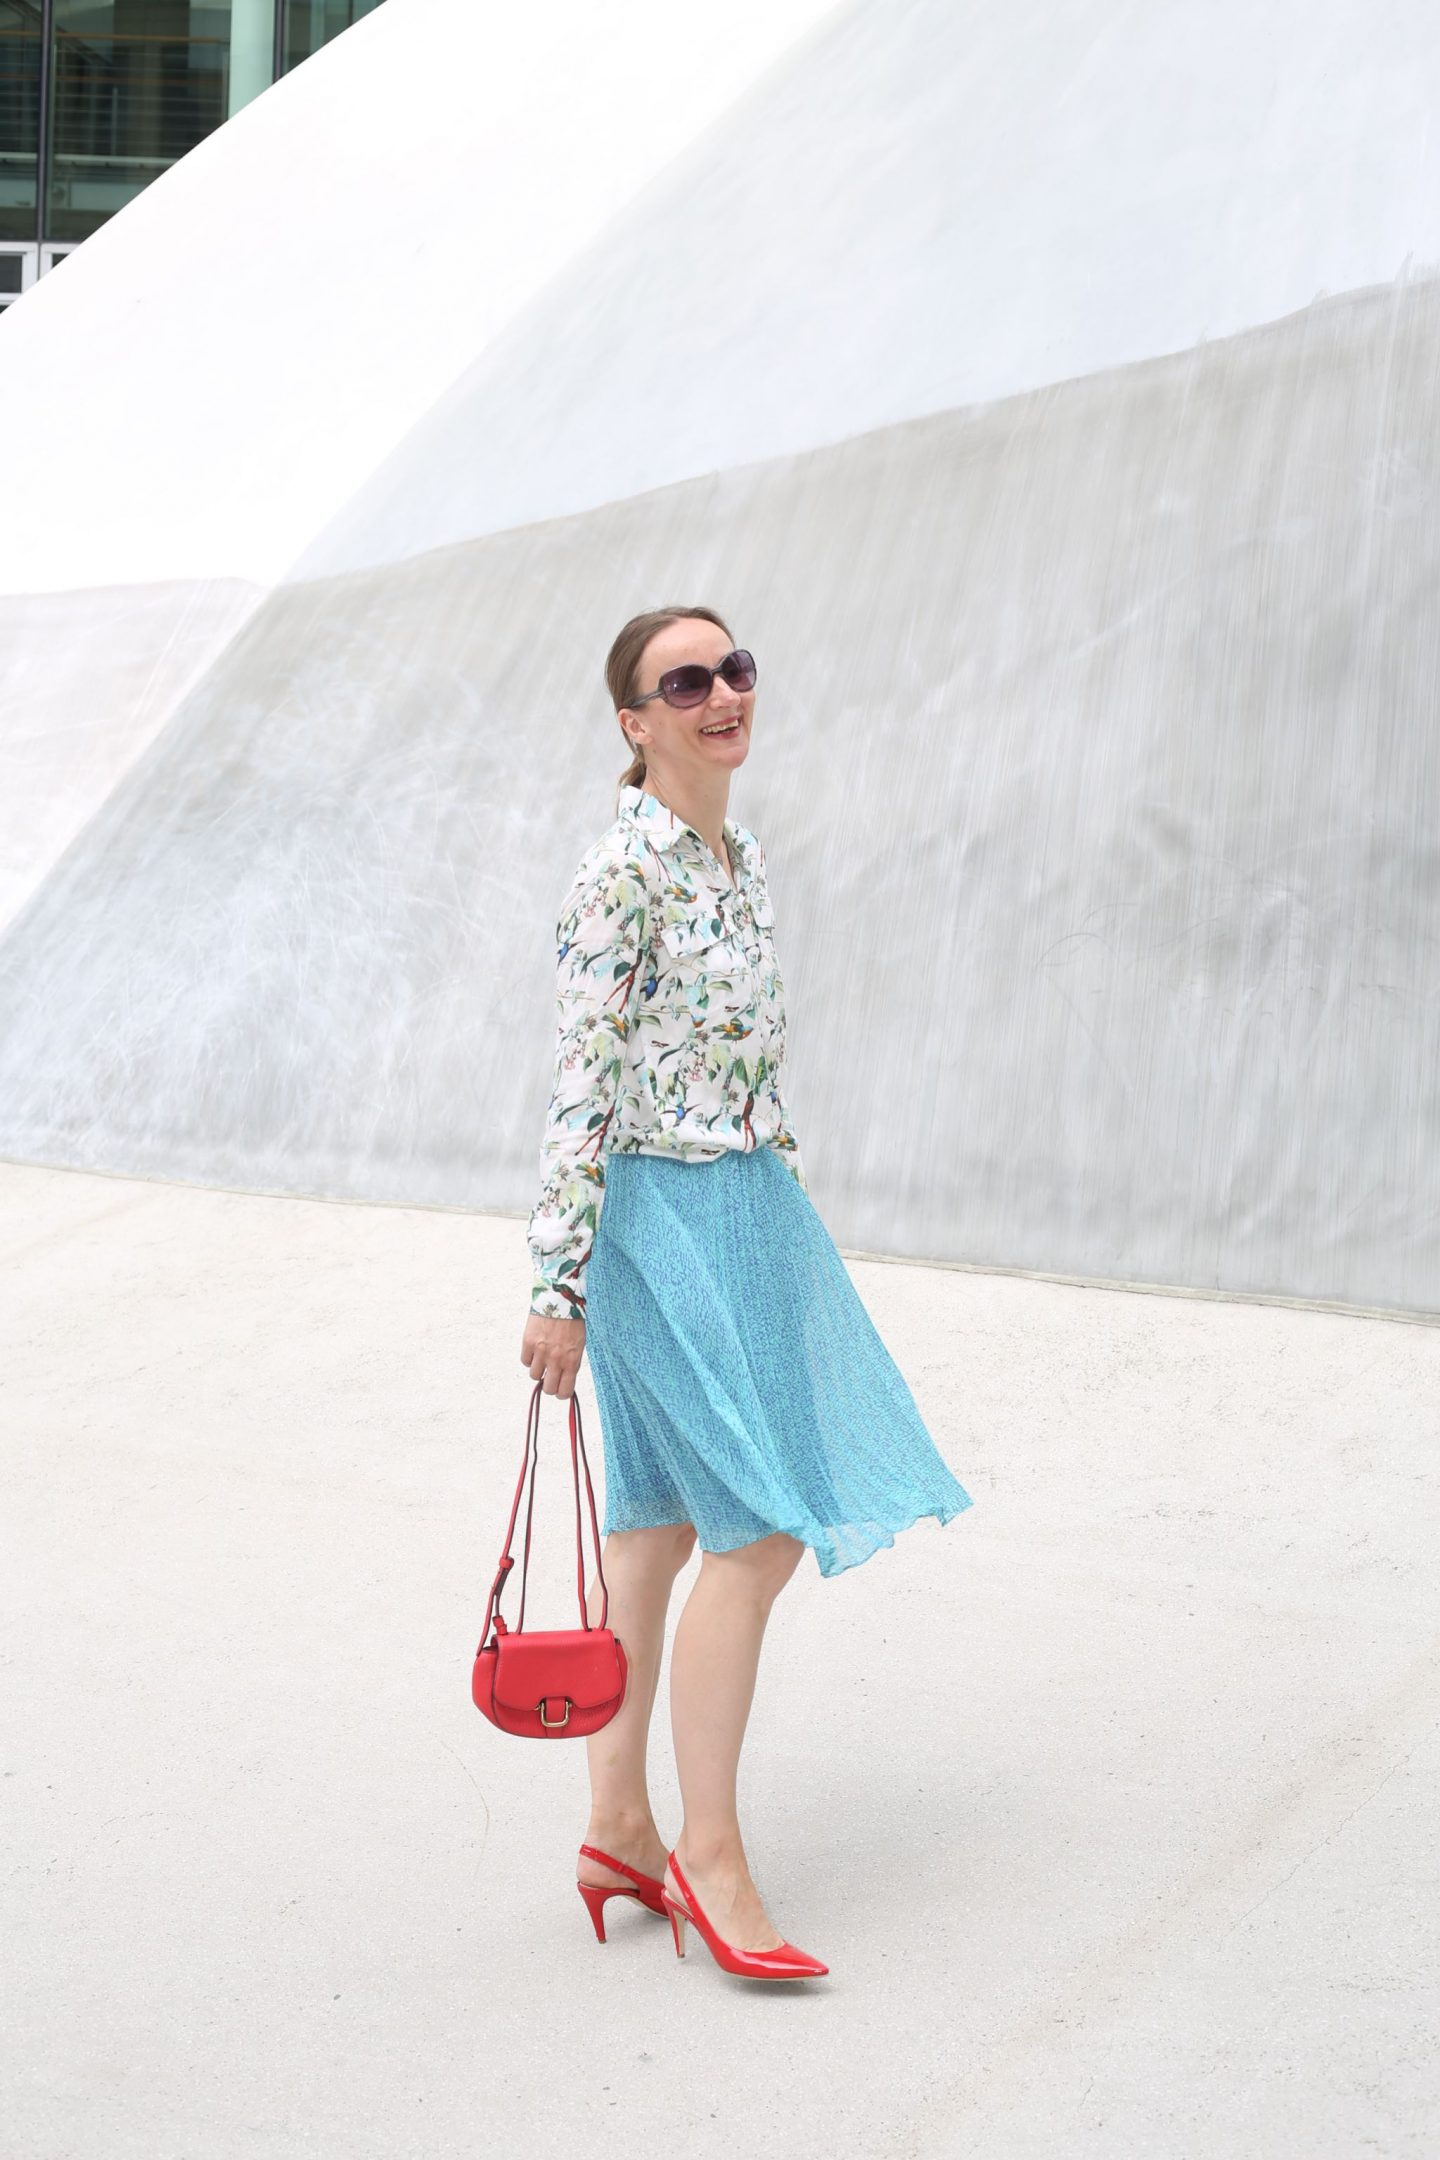 Bloggerinterview Sabina – Oceanblue Style at Manderley